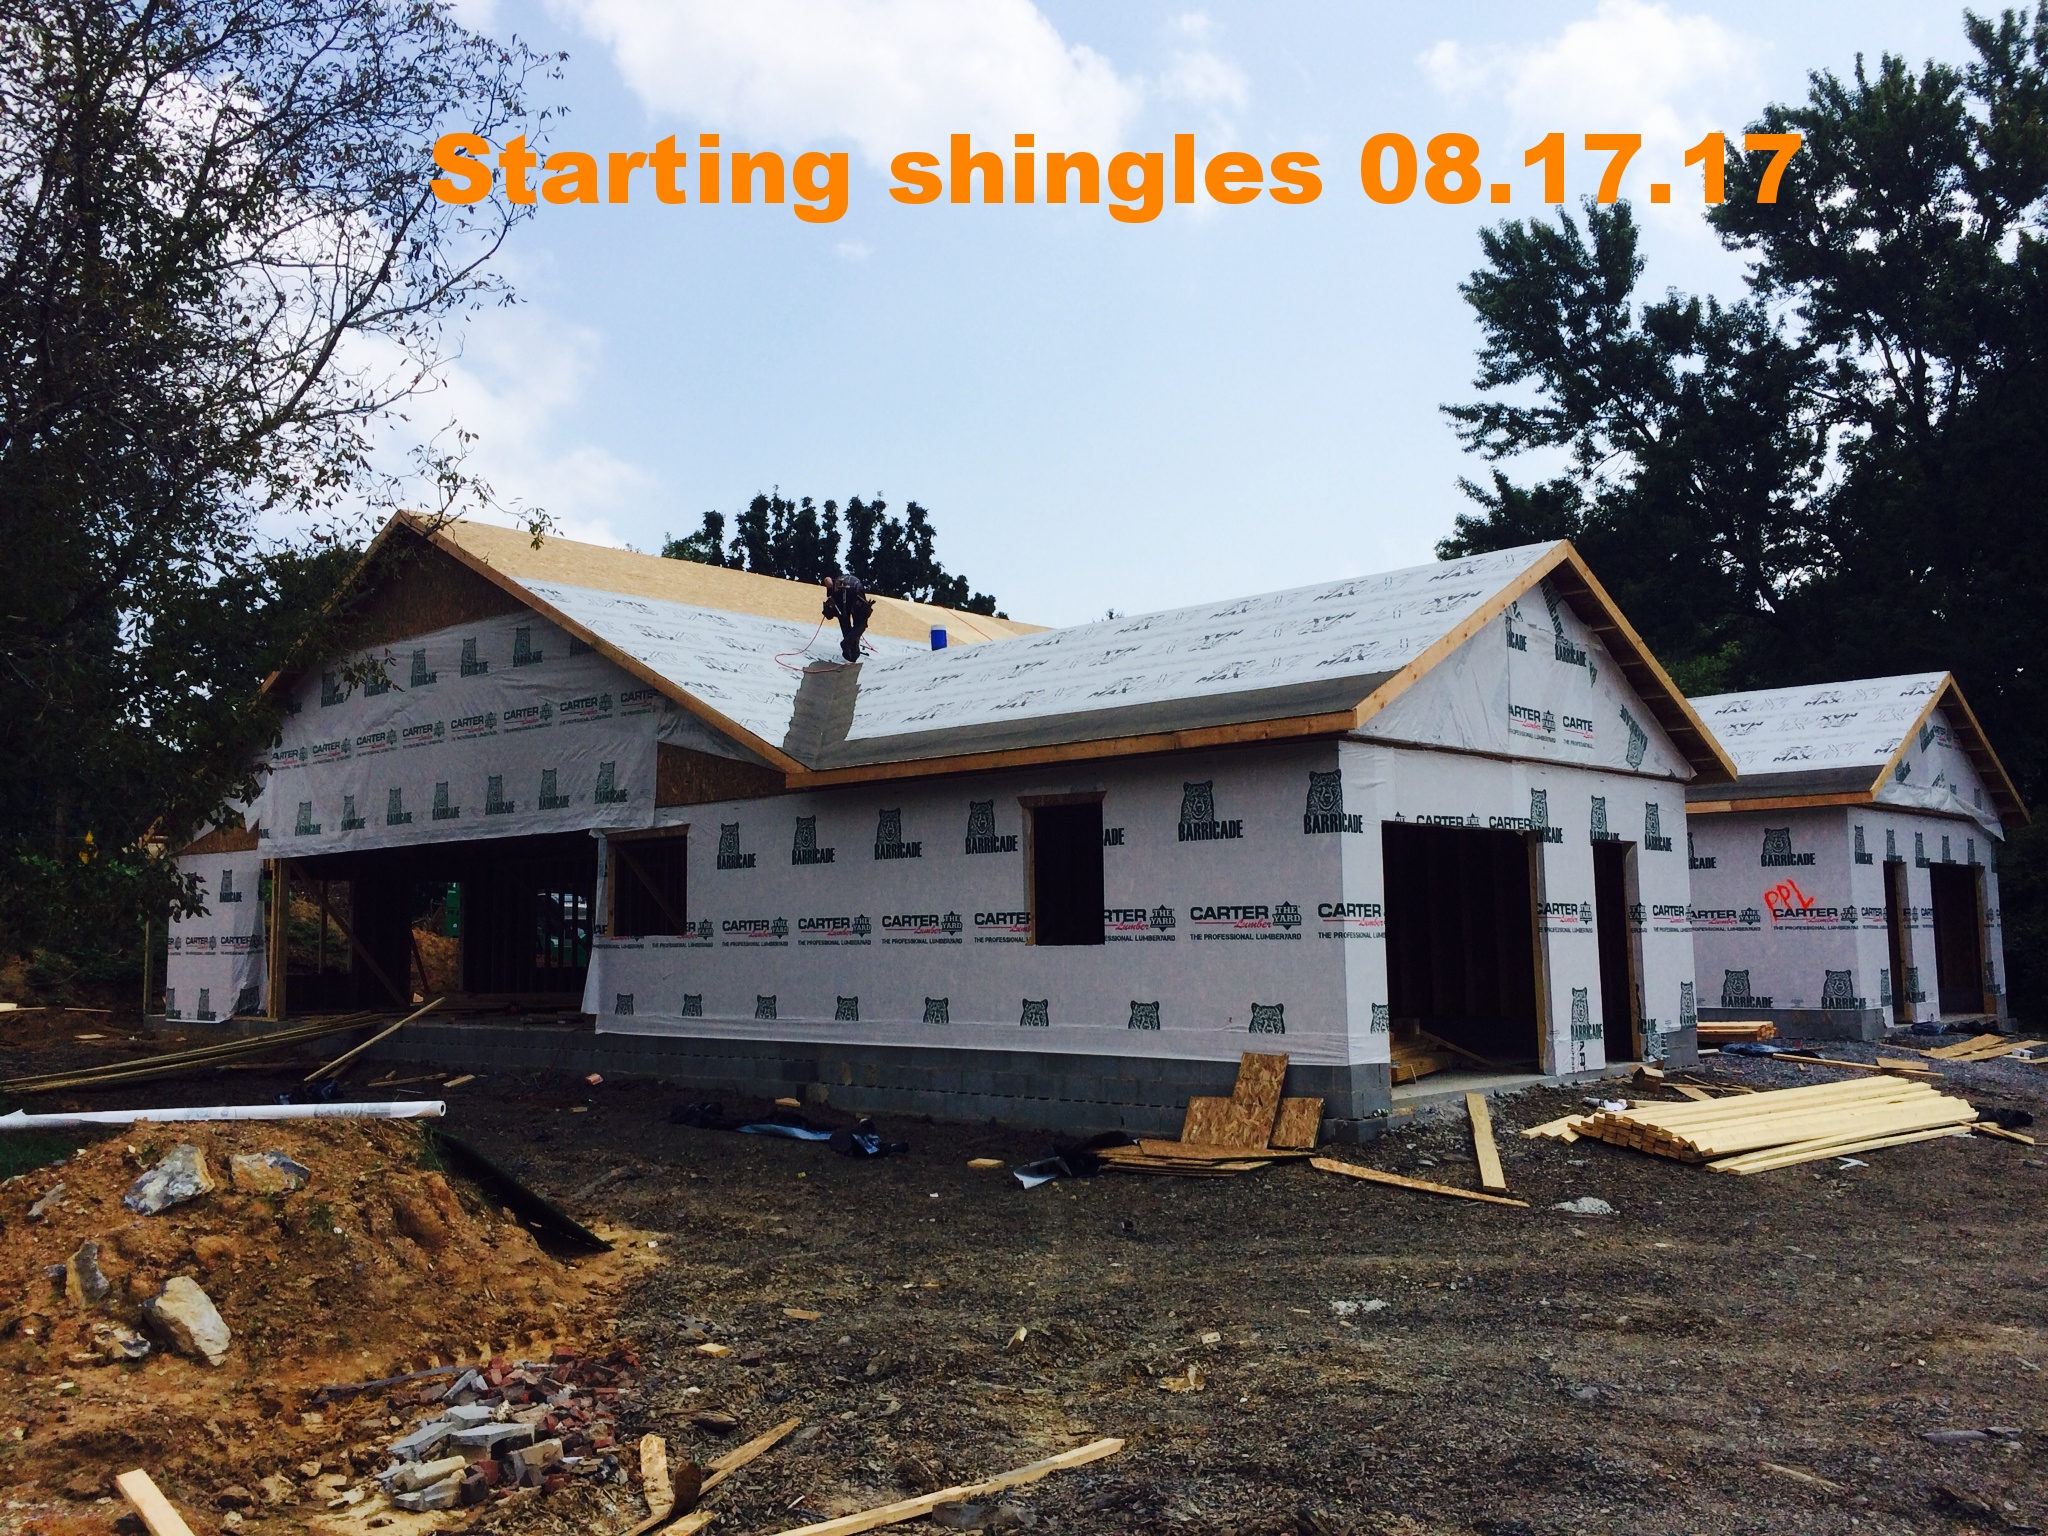 08.17.17 Getting ready for shingles.JPG